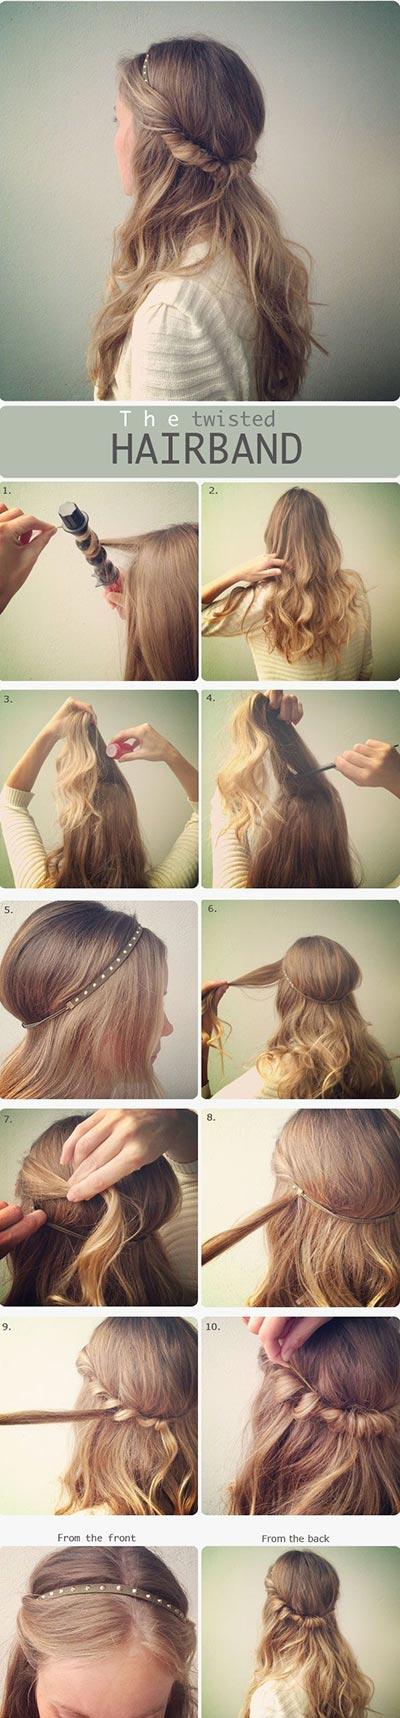 half-up-half-down-hairstyles-15